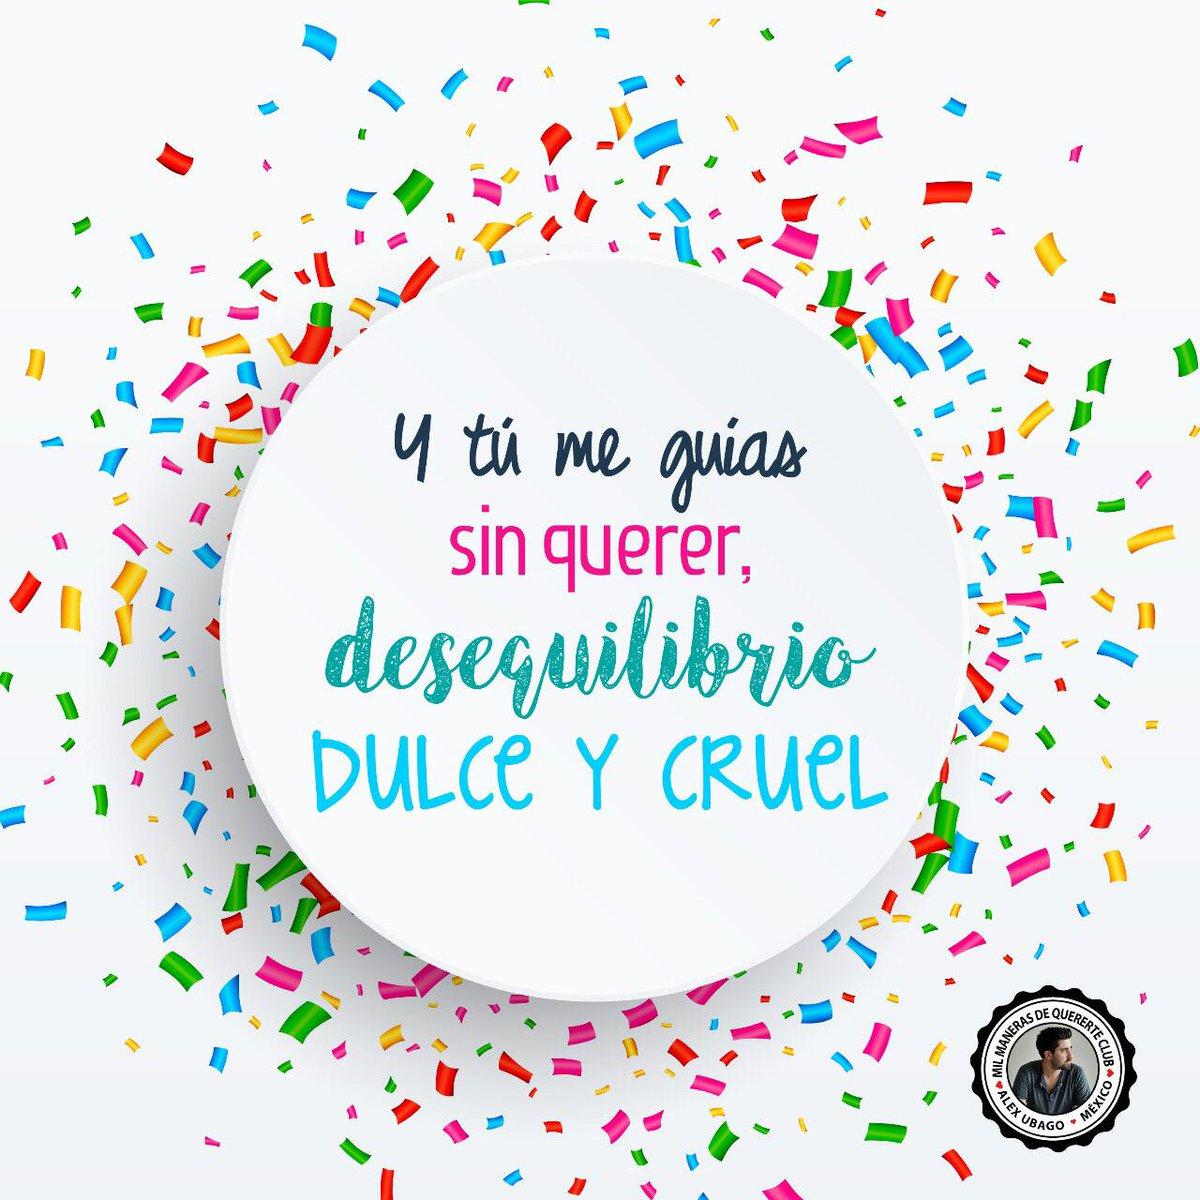 RT @milmanerasclub: #FelizJueves 💗 https://t.co/60gRhFEi6C